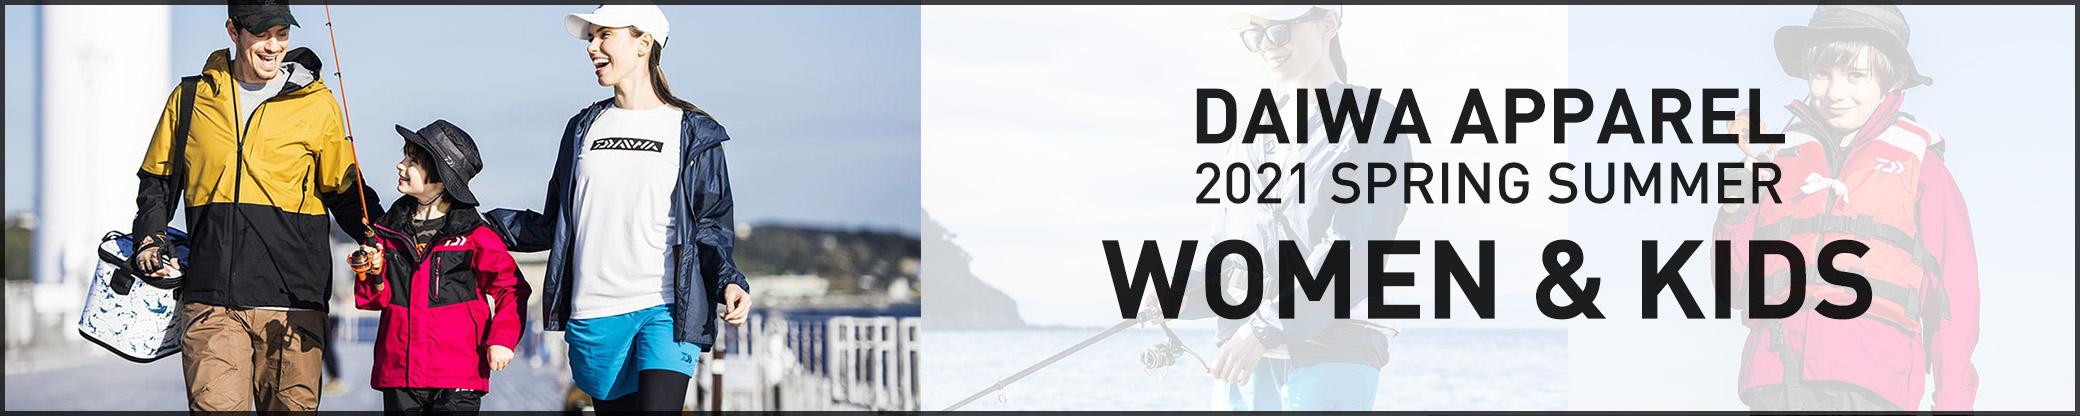 DAIWA APPAREL 2021SS WOMEN & KIDS